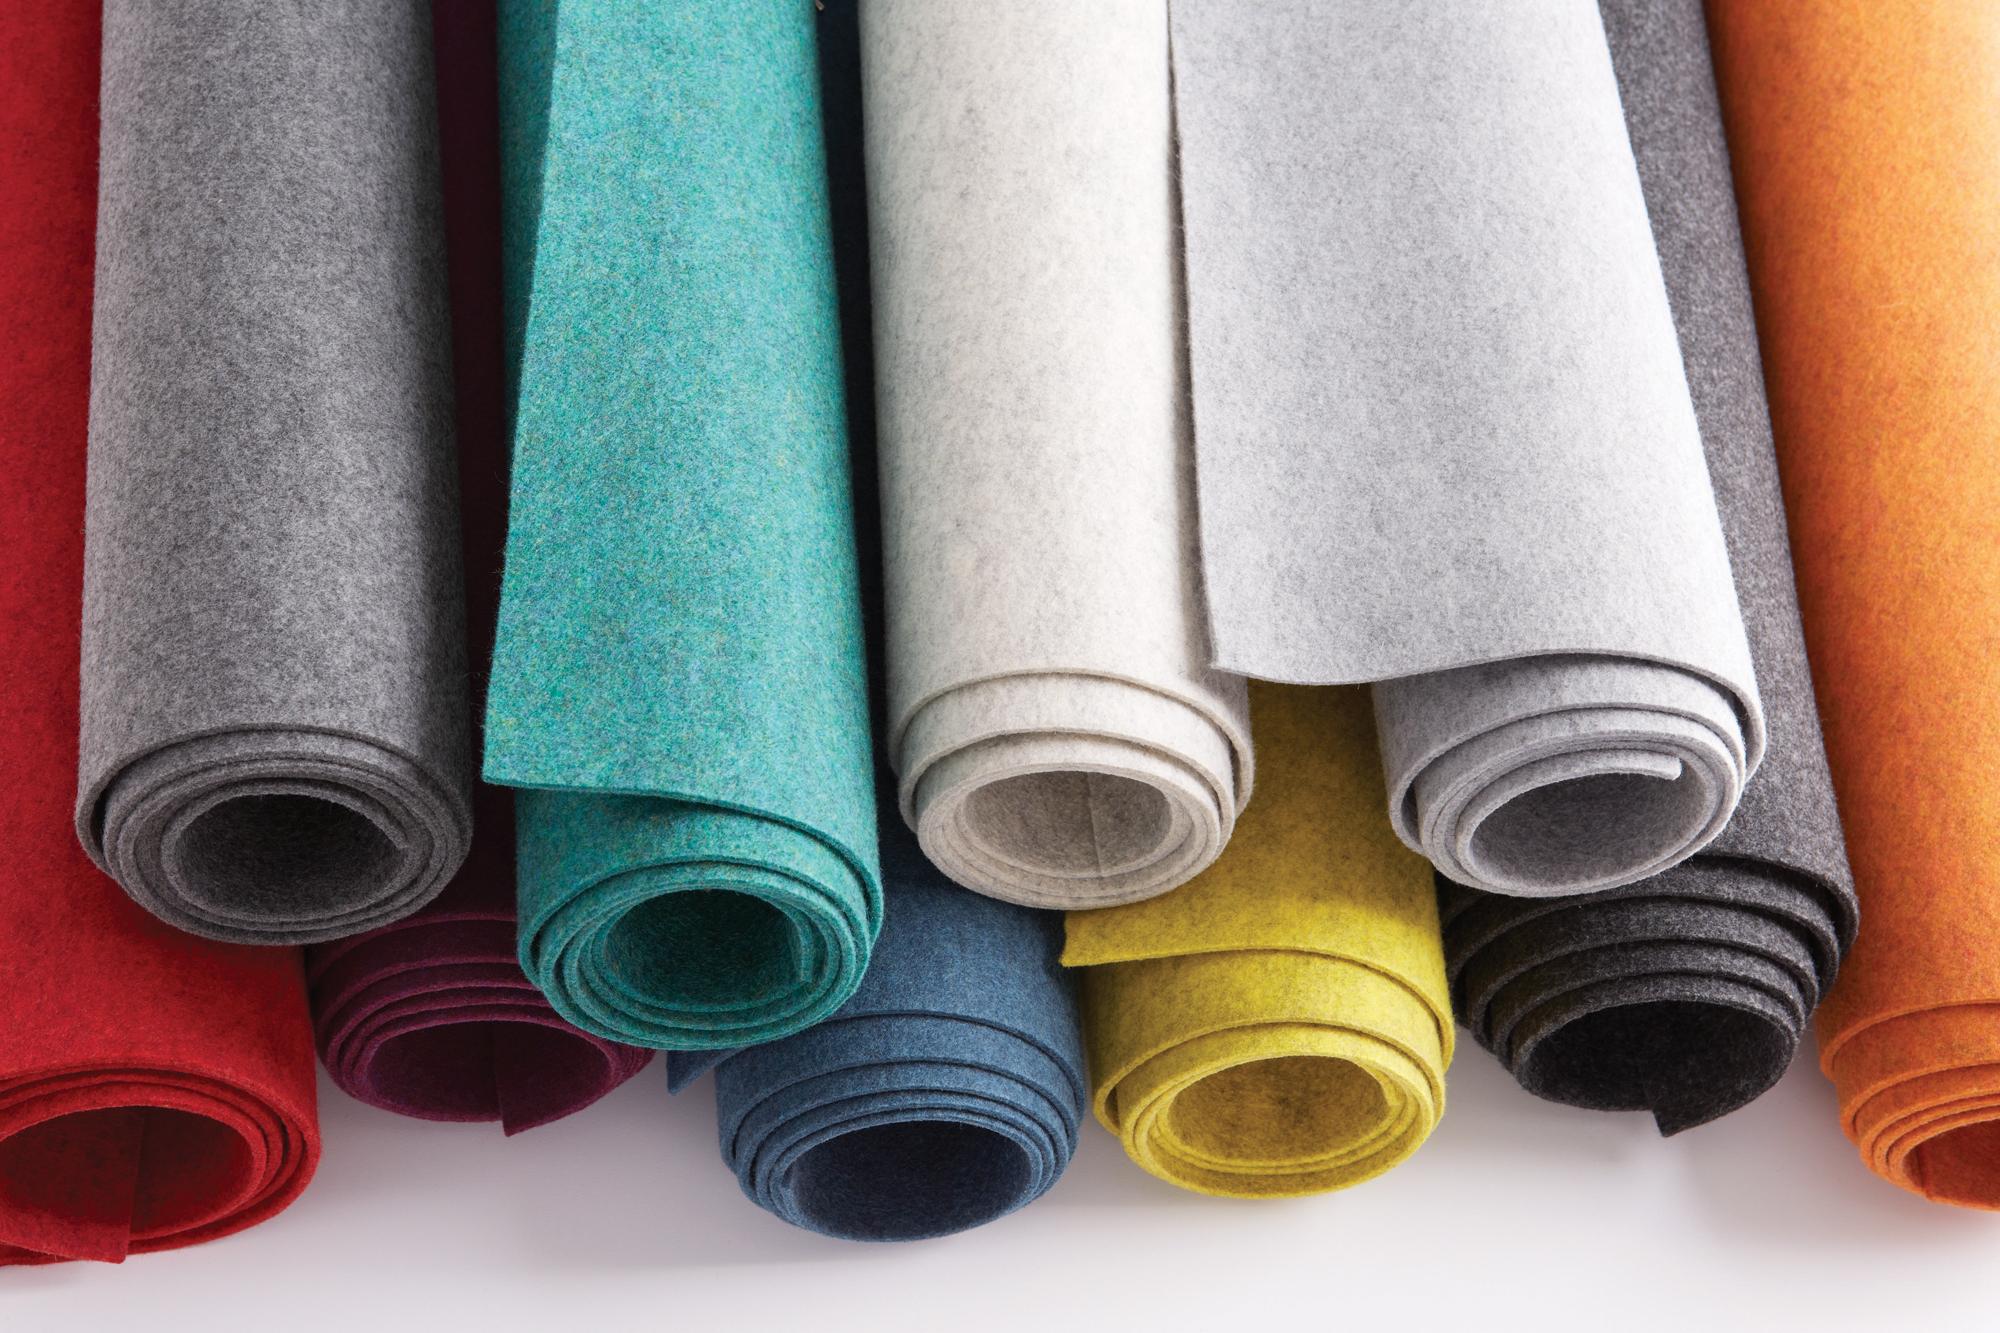 Designtex Fabric - Felt